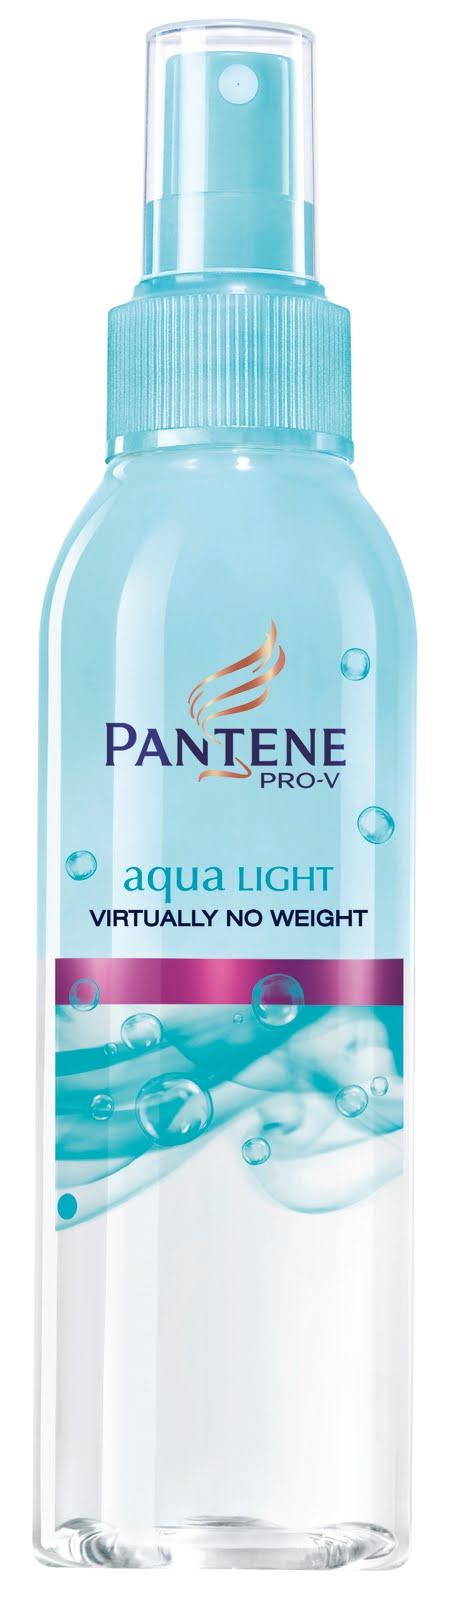 [Afbeelding: Pantene+Pro-V+Aqua+Leave-In+Spray+Treatment.jpg]